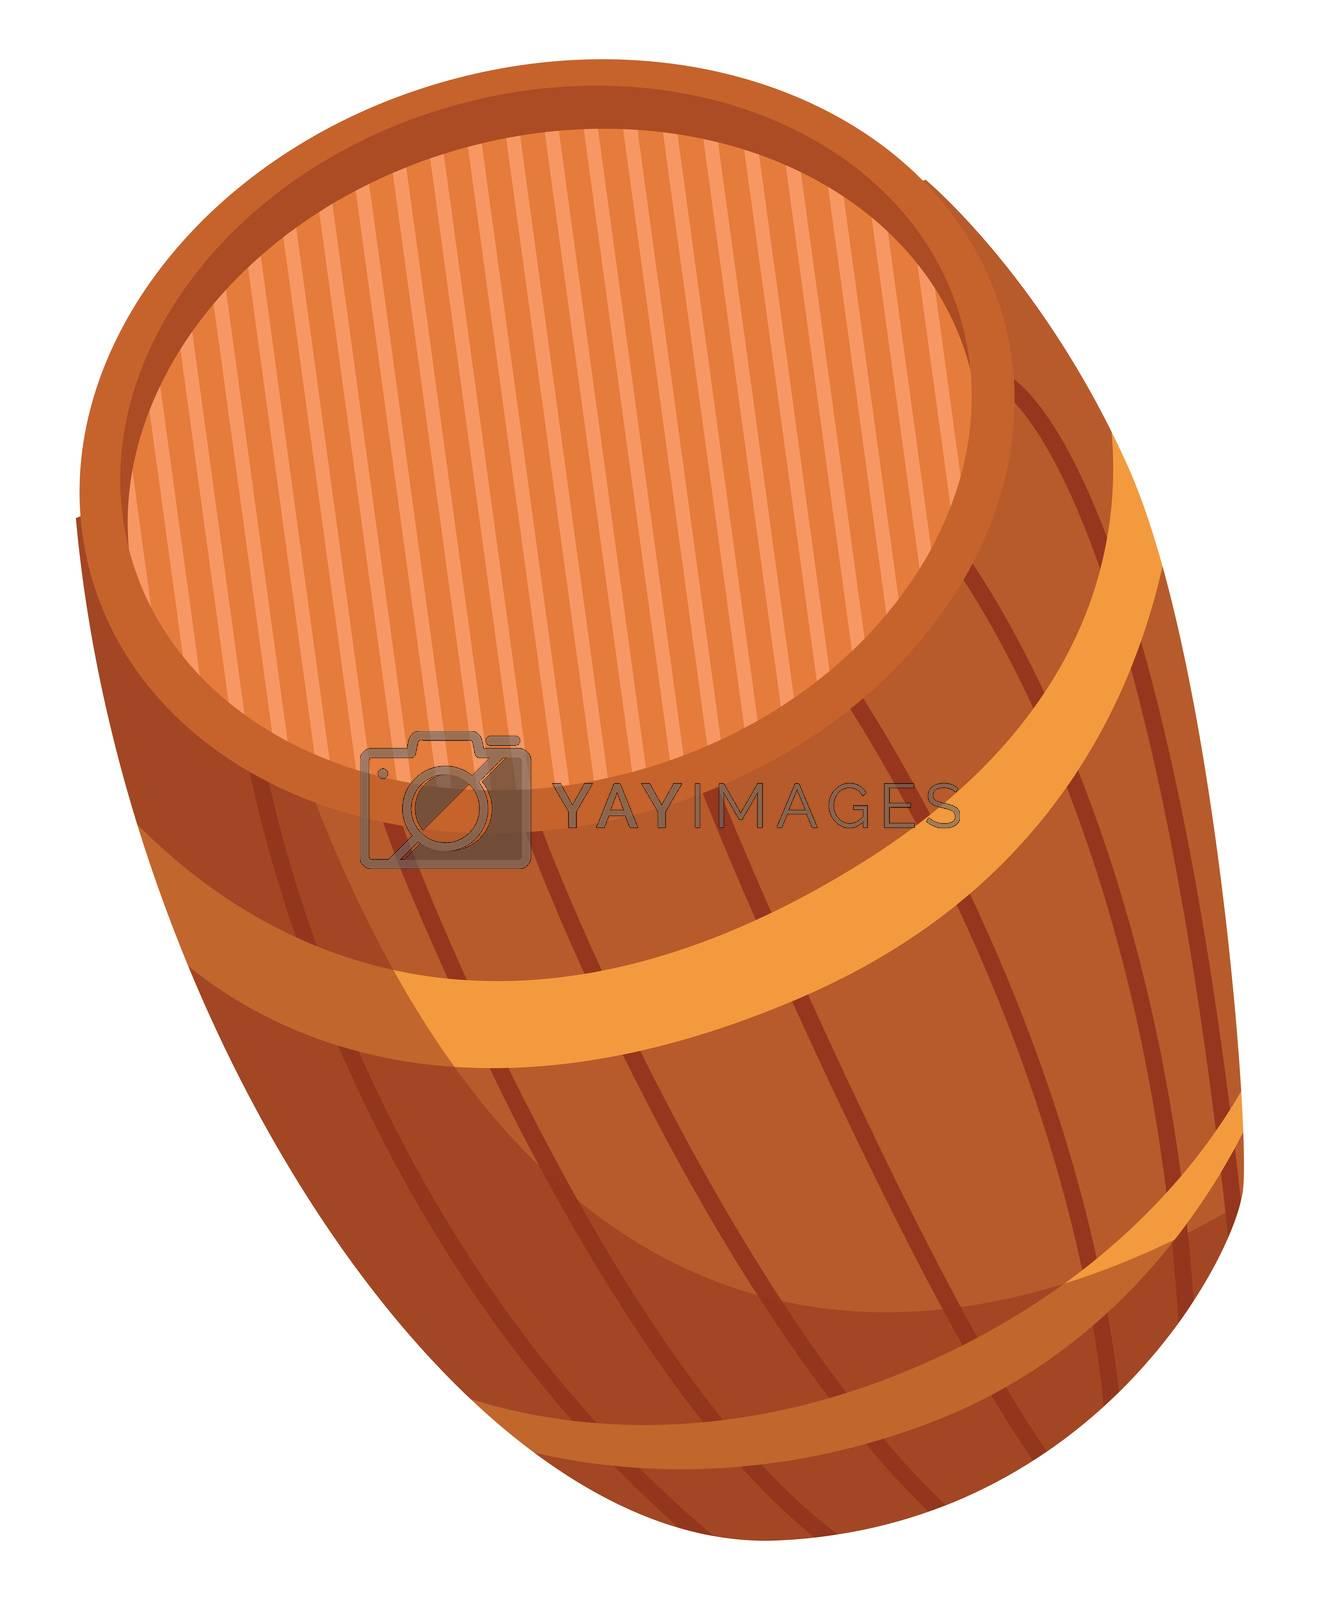 Wooden barrel, illustration, vector on white background